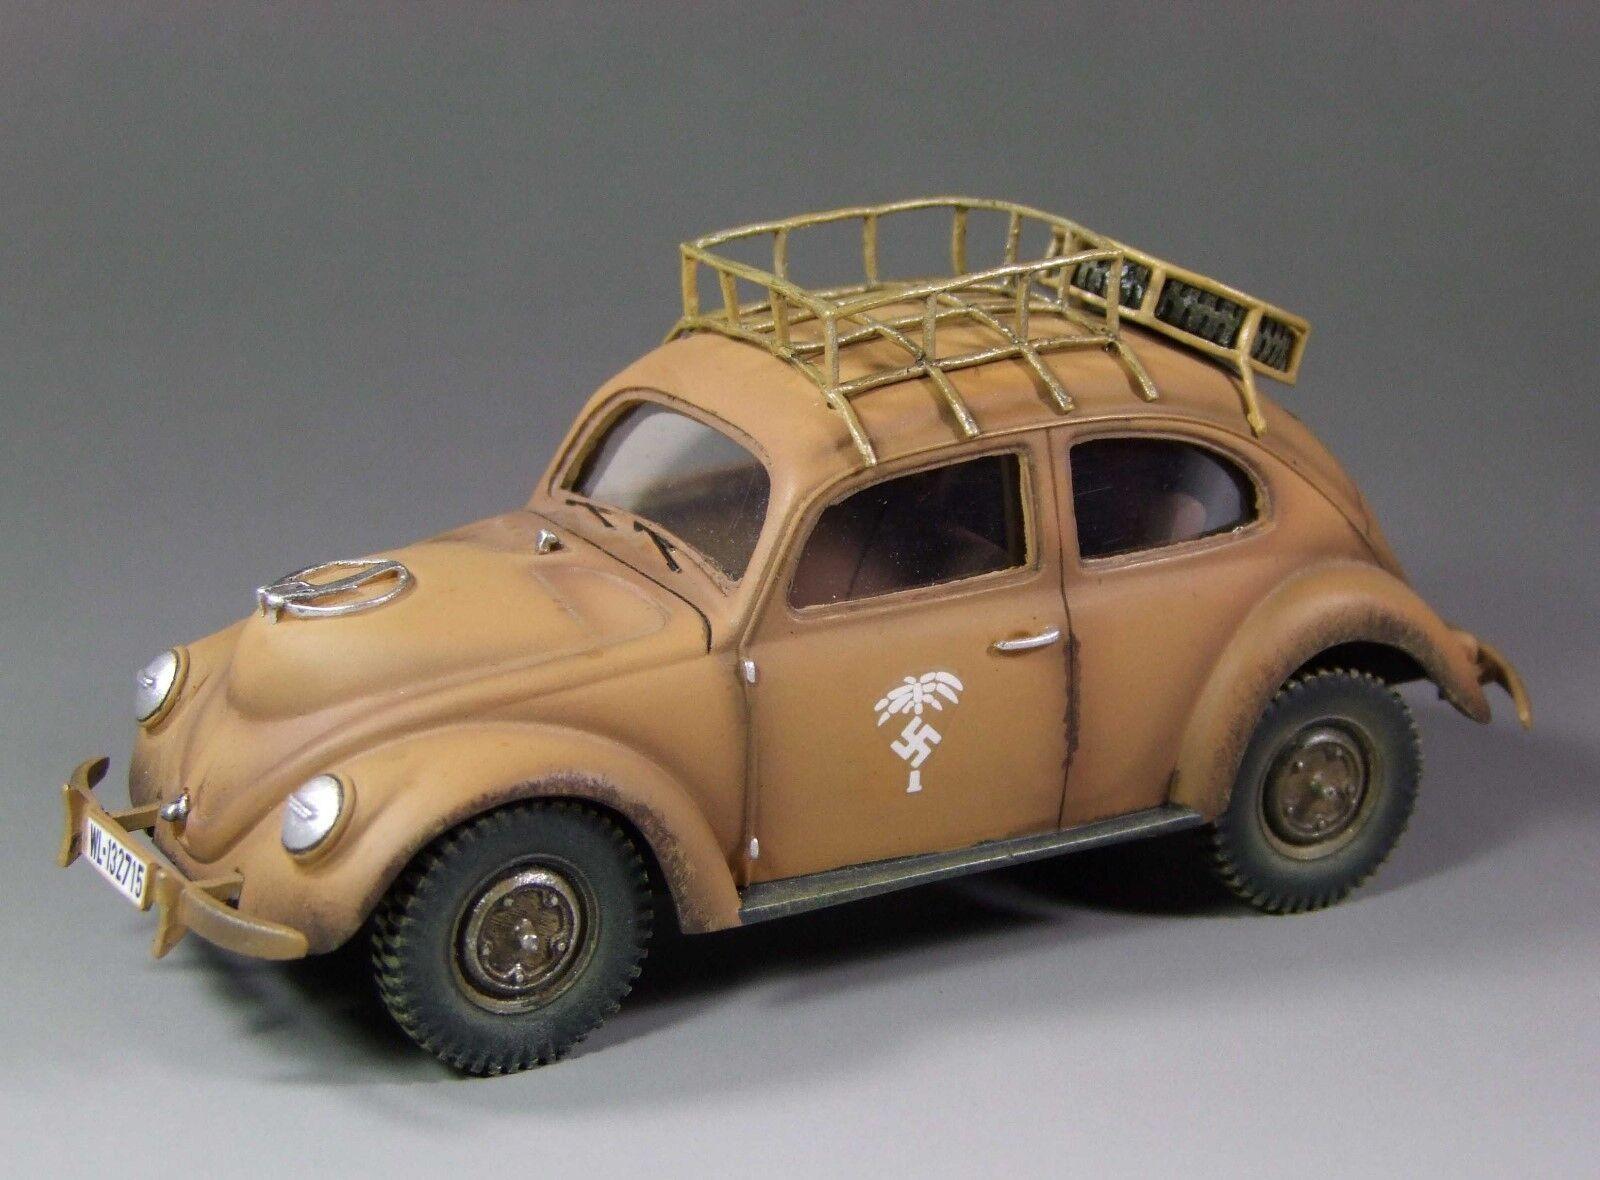 1 30 WW2 German Volkswagen Beetle DAK Wood burning version EC002